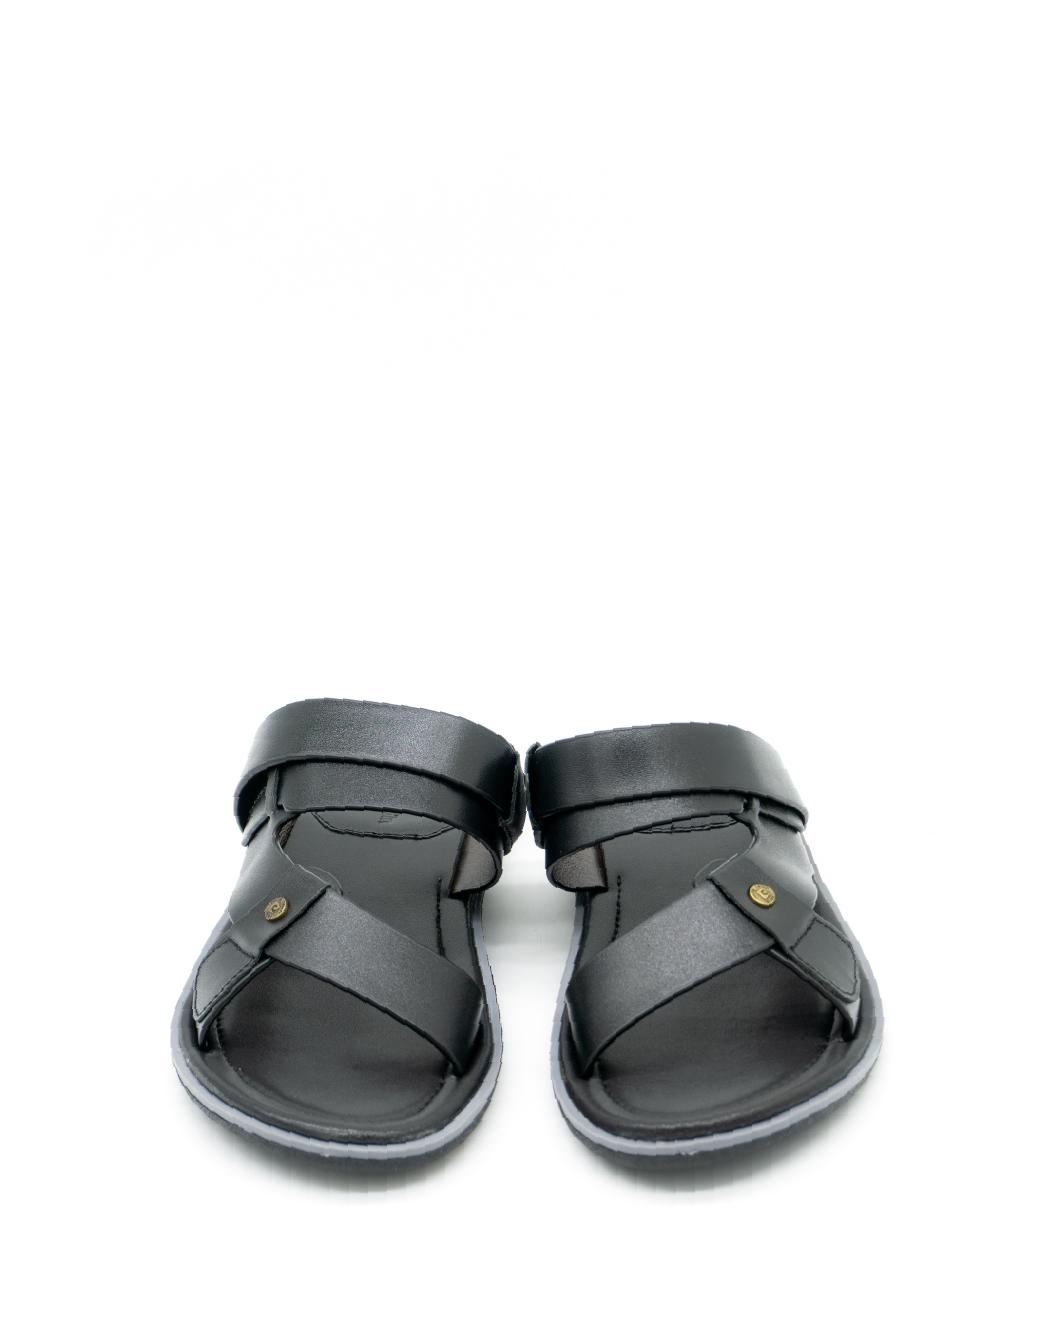 Hình ảnh Sandal Nam Cao Cấp Pierre Cardin - PCMFWLE 127